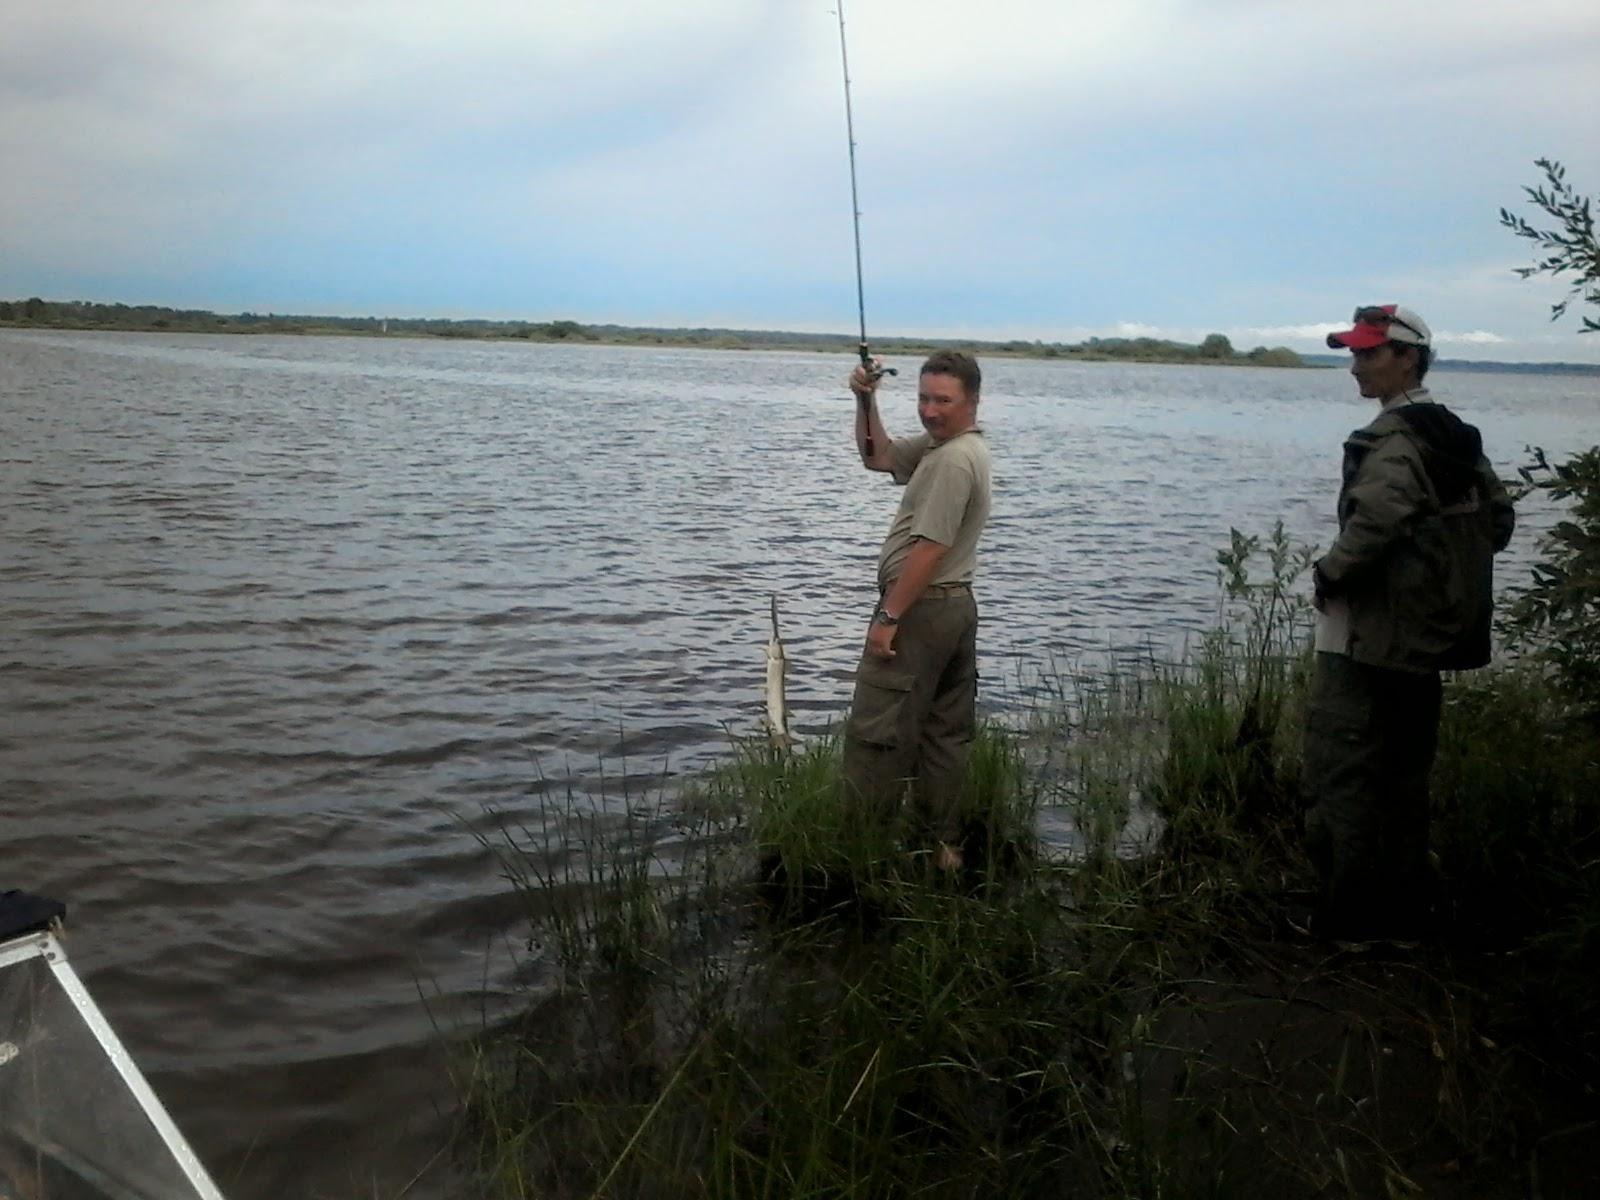 рыбалка на озере шибаево видео